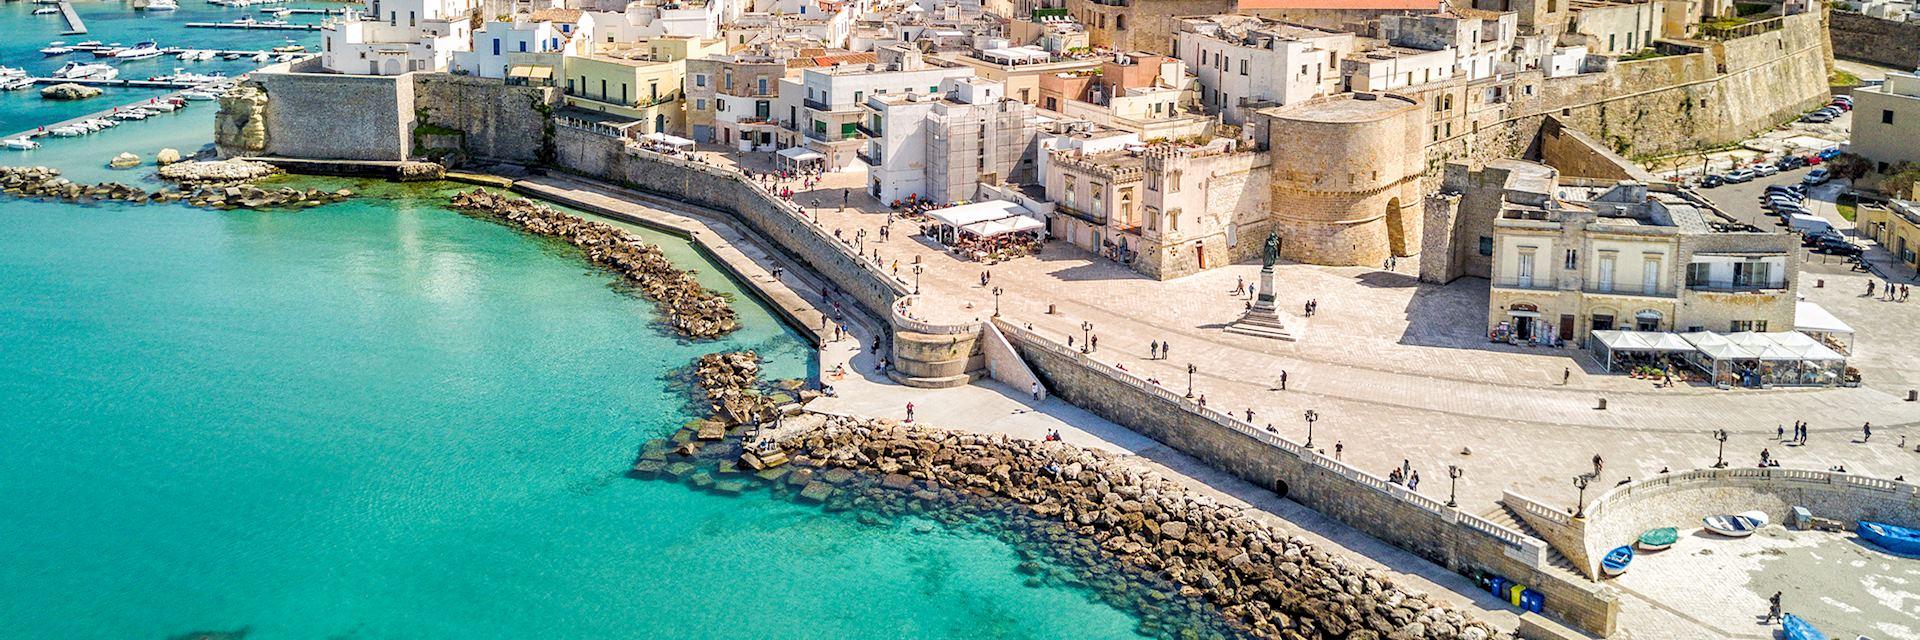 Otranto old town